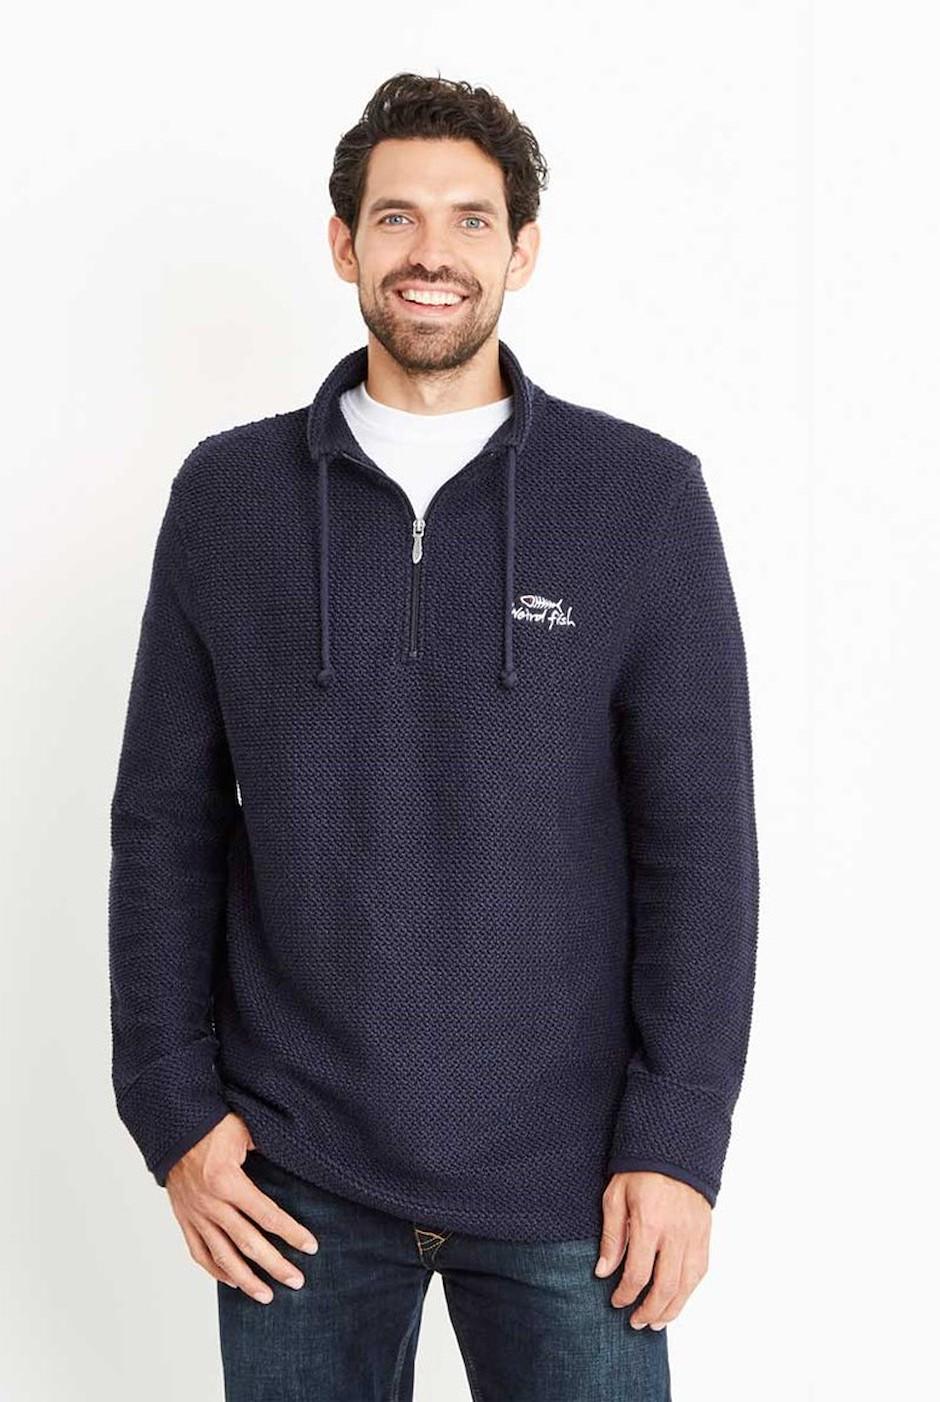 Skipper Classic ¼ Zip Macaroni Sweatshirt Carbon